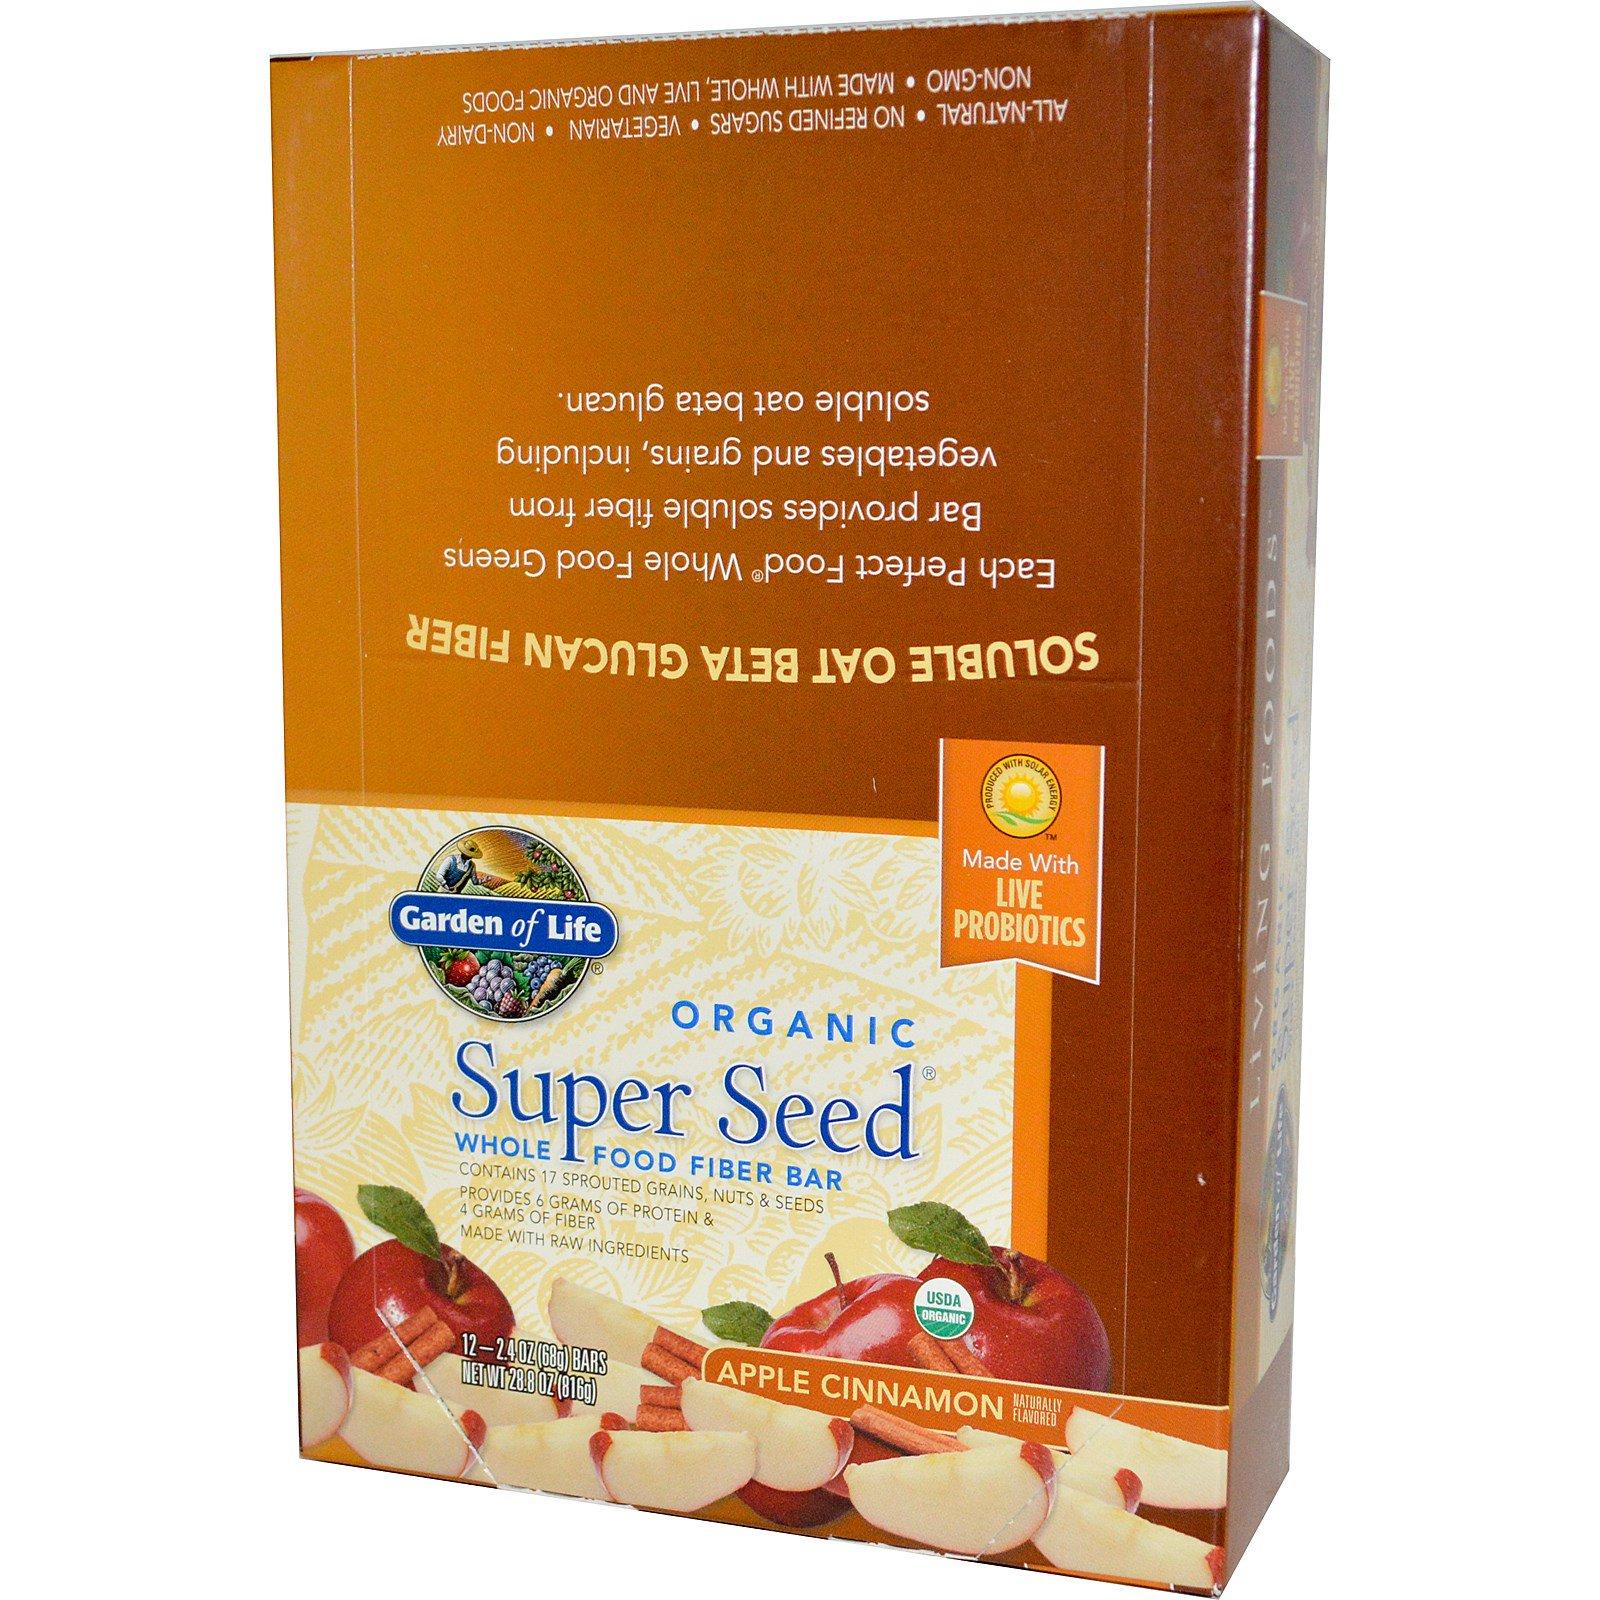 4418cb046fa Garden of Life, Organic, Super Seed, Whole Food Fiber Bar, Apple Cinnamon,  12 Bars, 2.4 oz (68 g) (Discontinued Item)